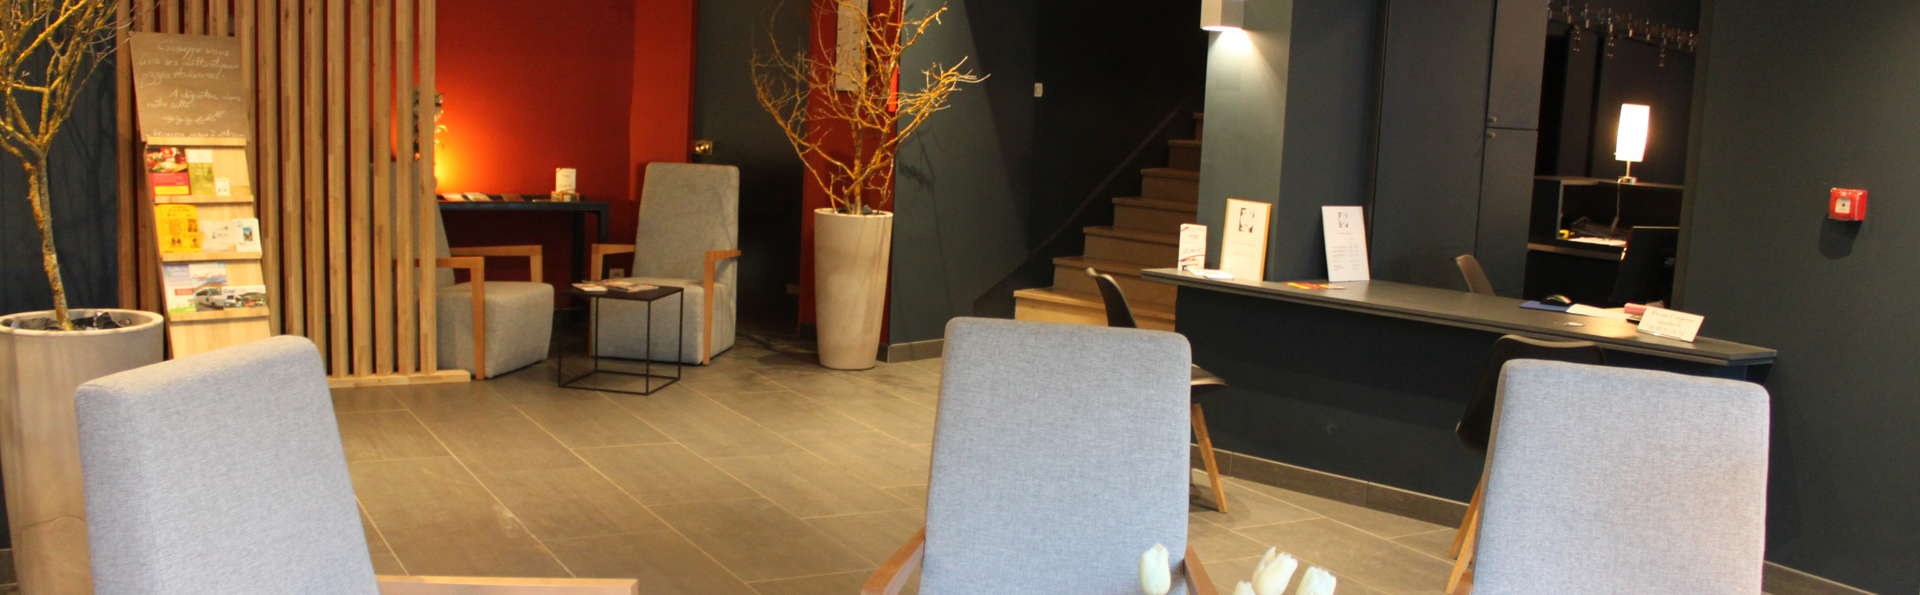 Mon Hôtel à Gap - MON_HOTEL_A_GAP__2_.JPG